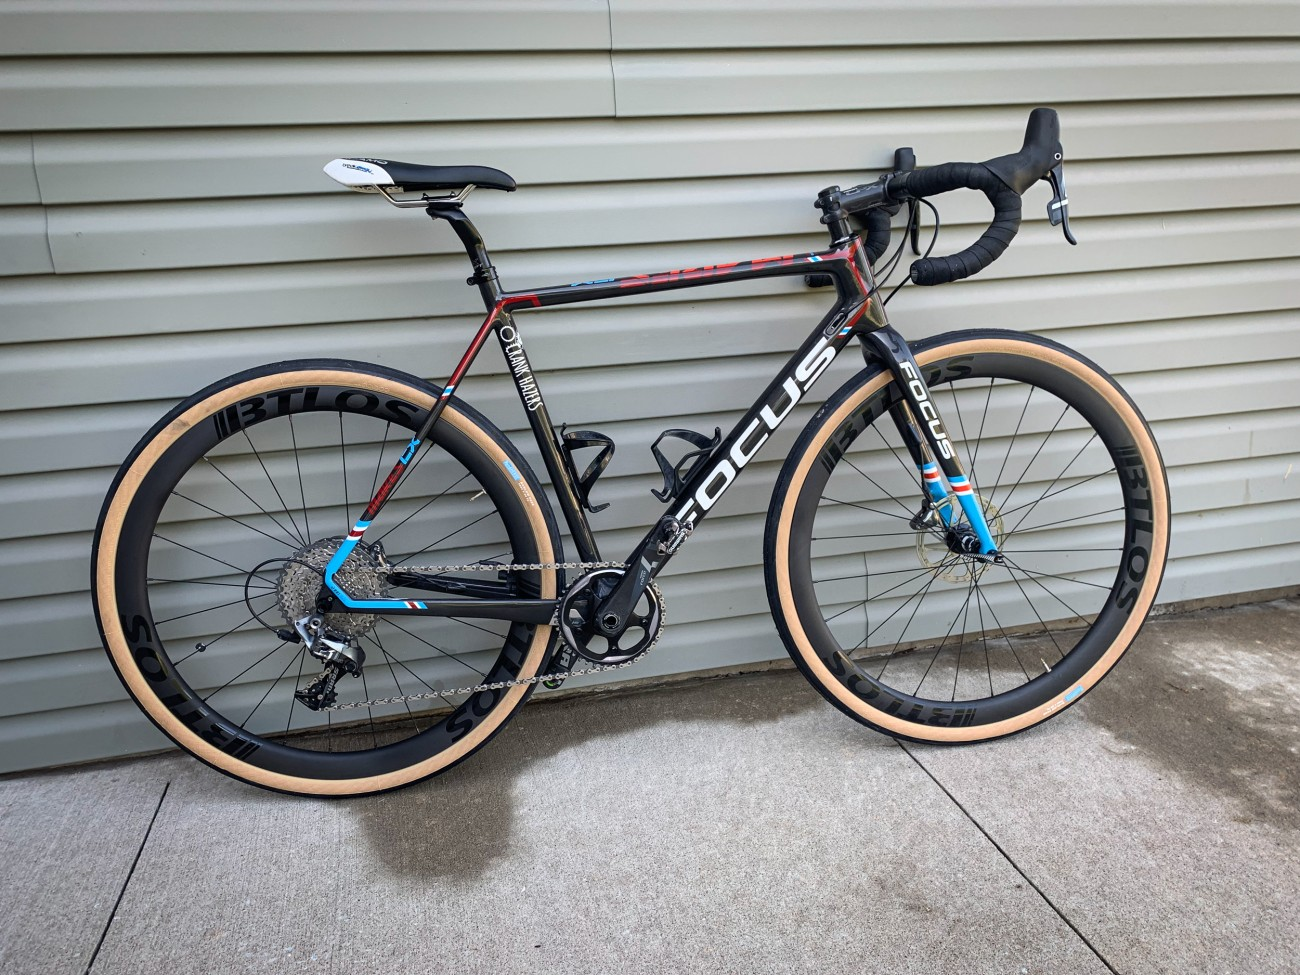 gx40 40mm depth carbon wheels